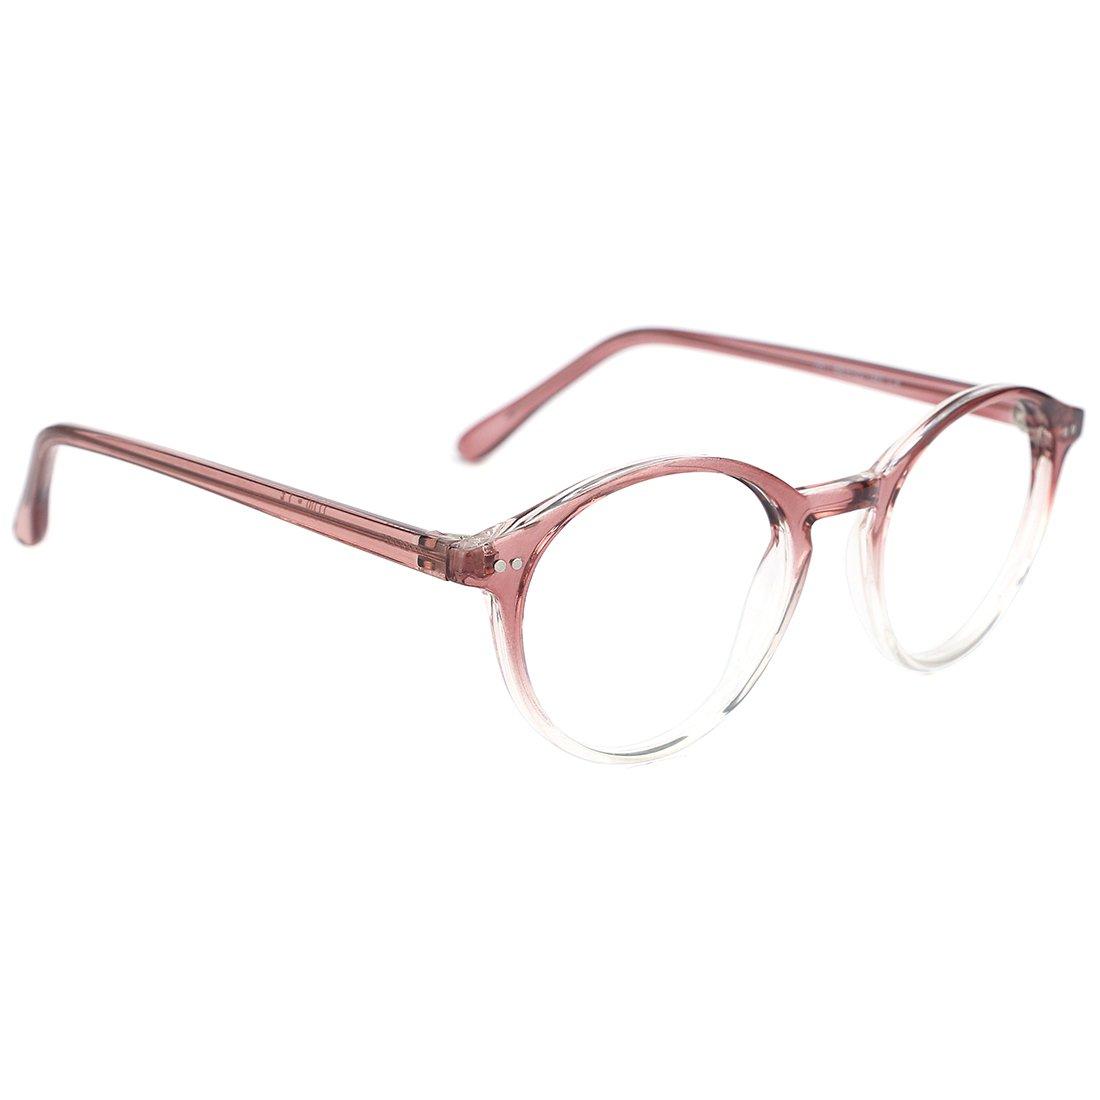 25a976bbda3 TIJN Vintage Women Thick Round Rim Non-prescription Glasses Eyeglasses  Clear Lens 00076101